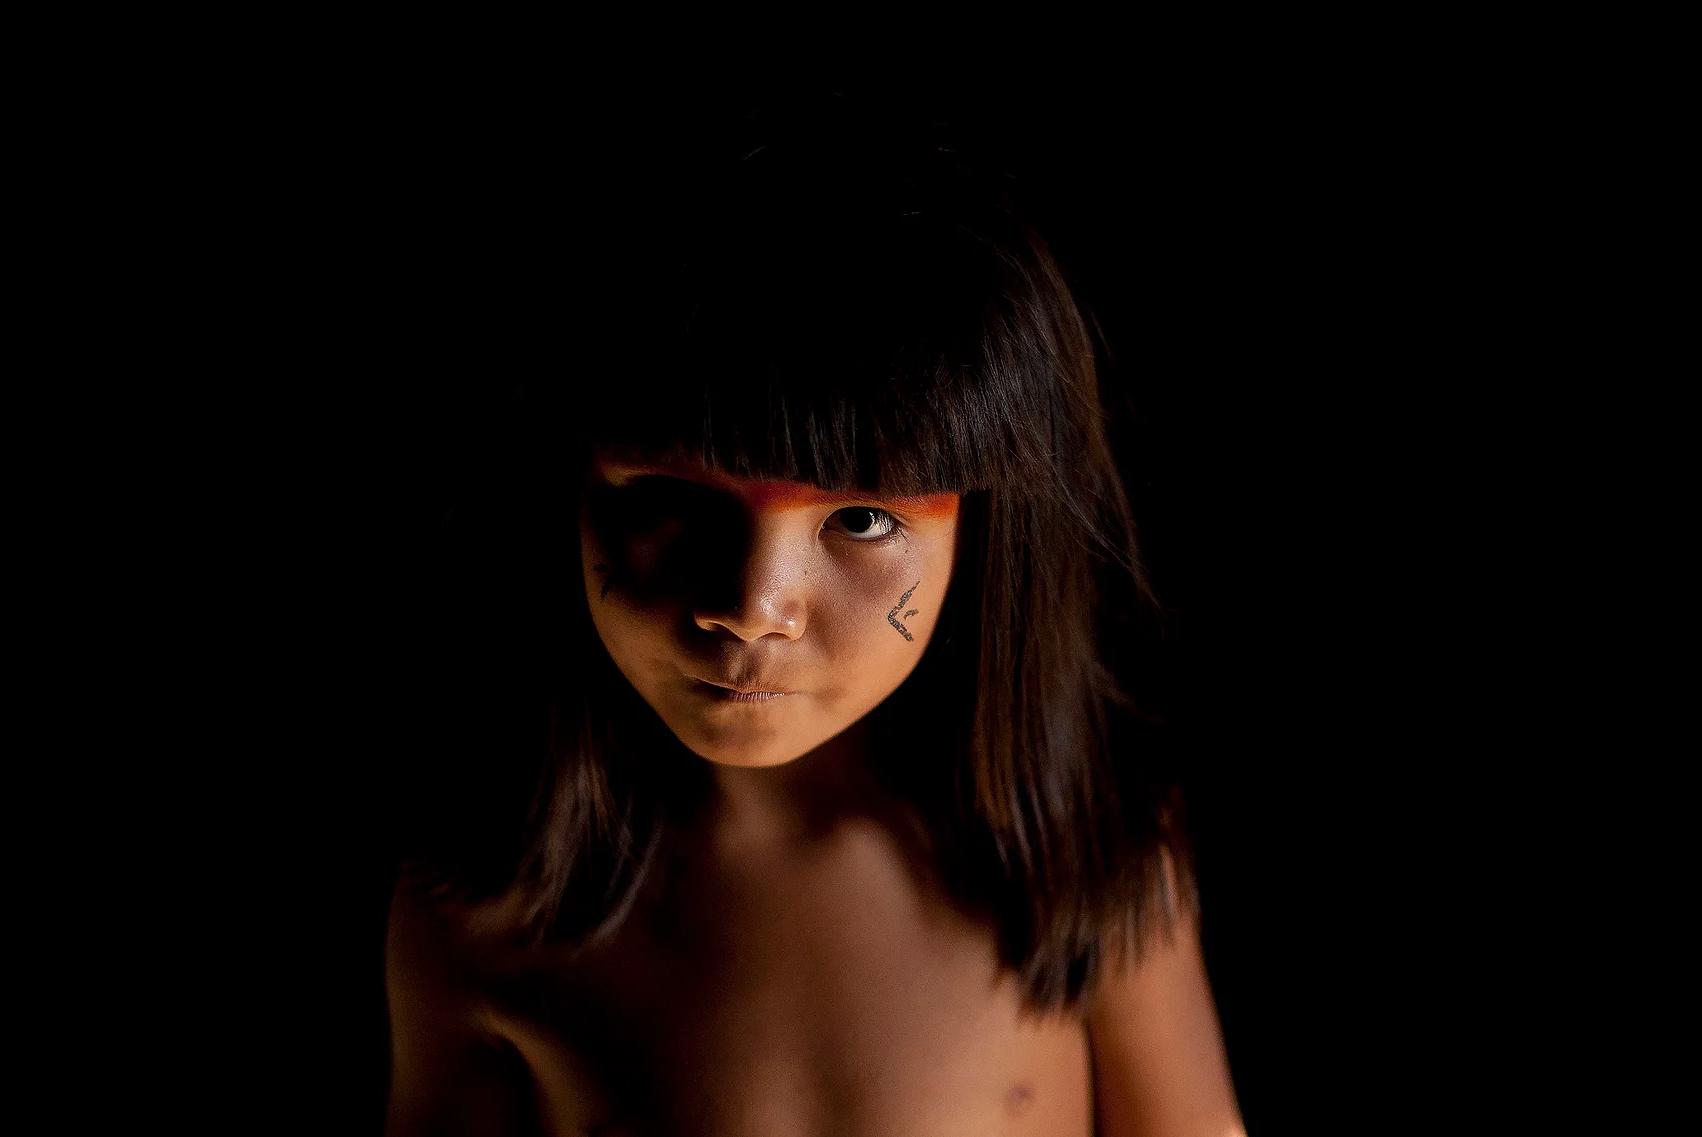 color photo by Alex Almeida from Brazil Tropical light. child, portrait